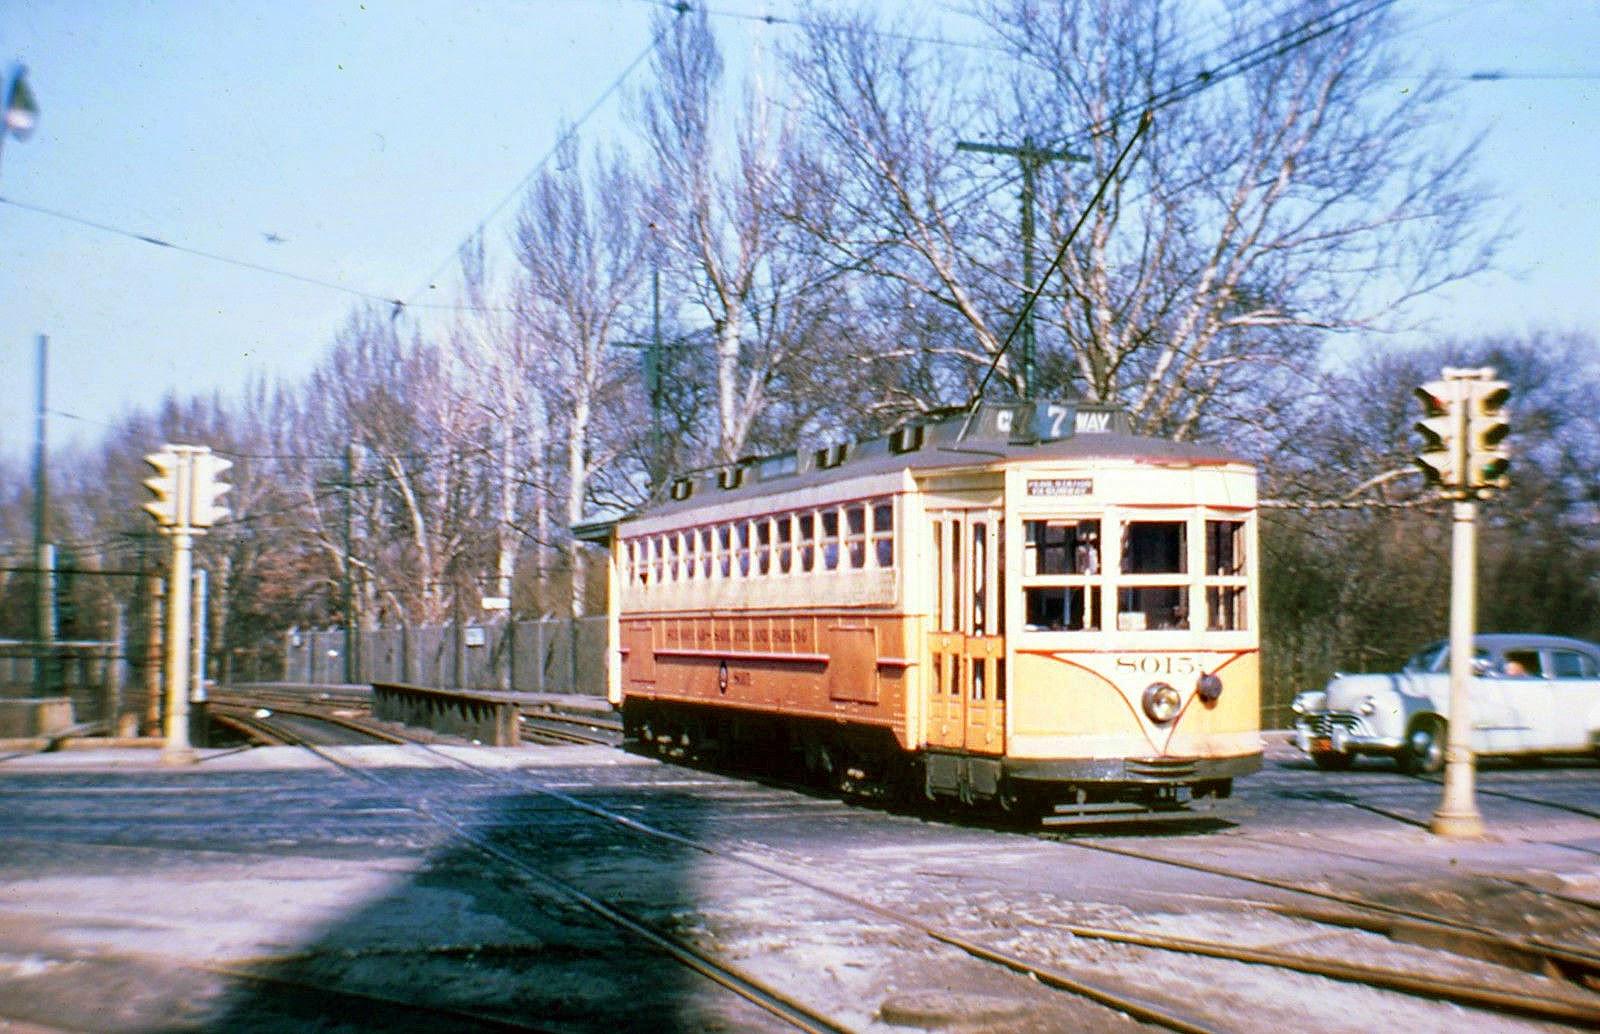 Transpress nz new jersey public service trolley njt for 302 terrace ave jersey city nj